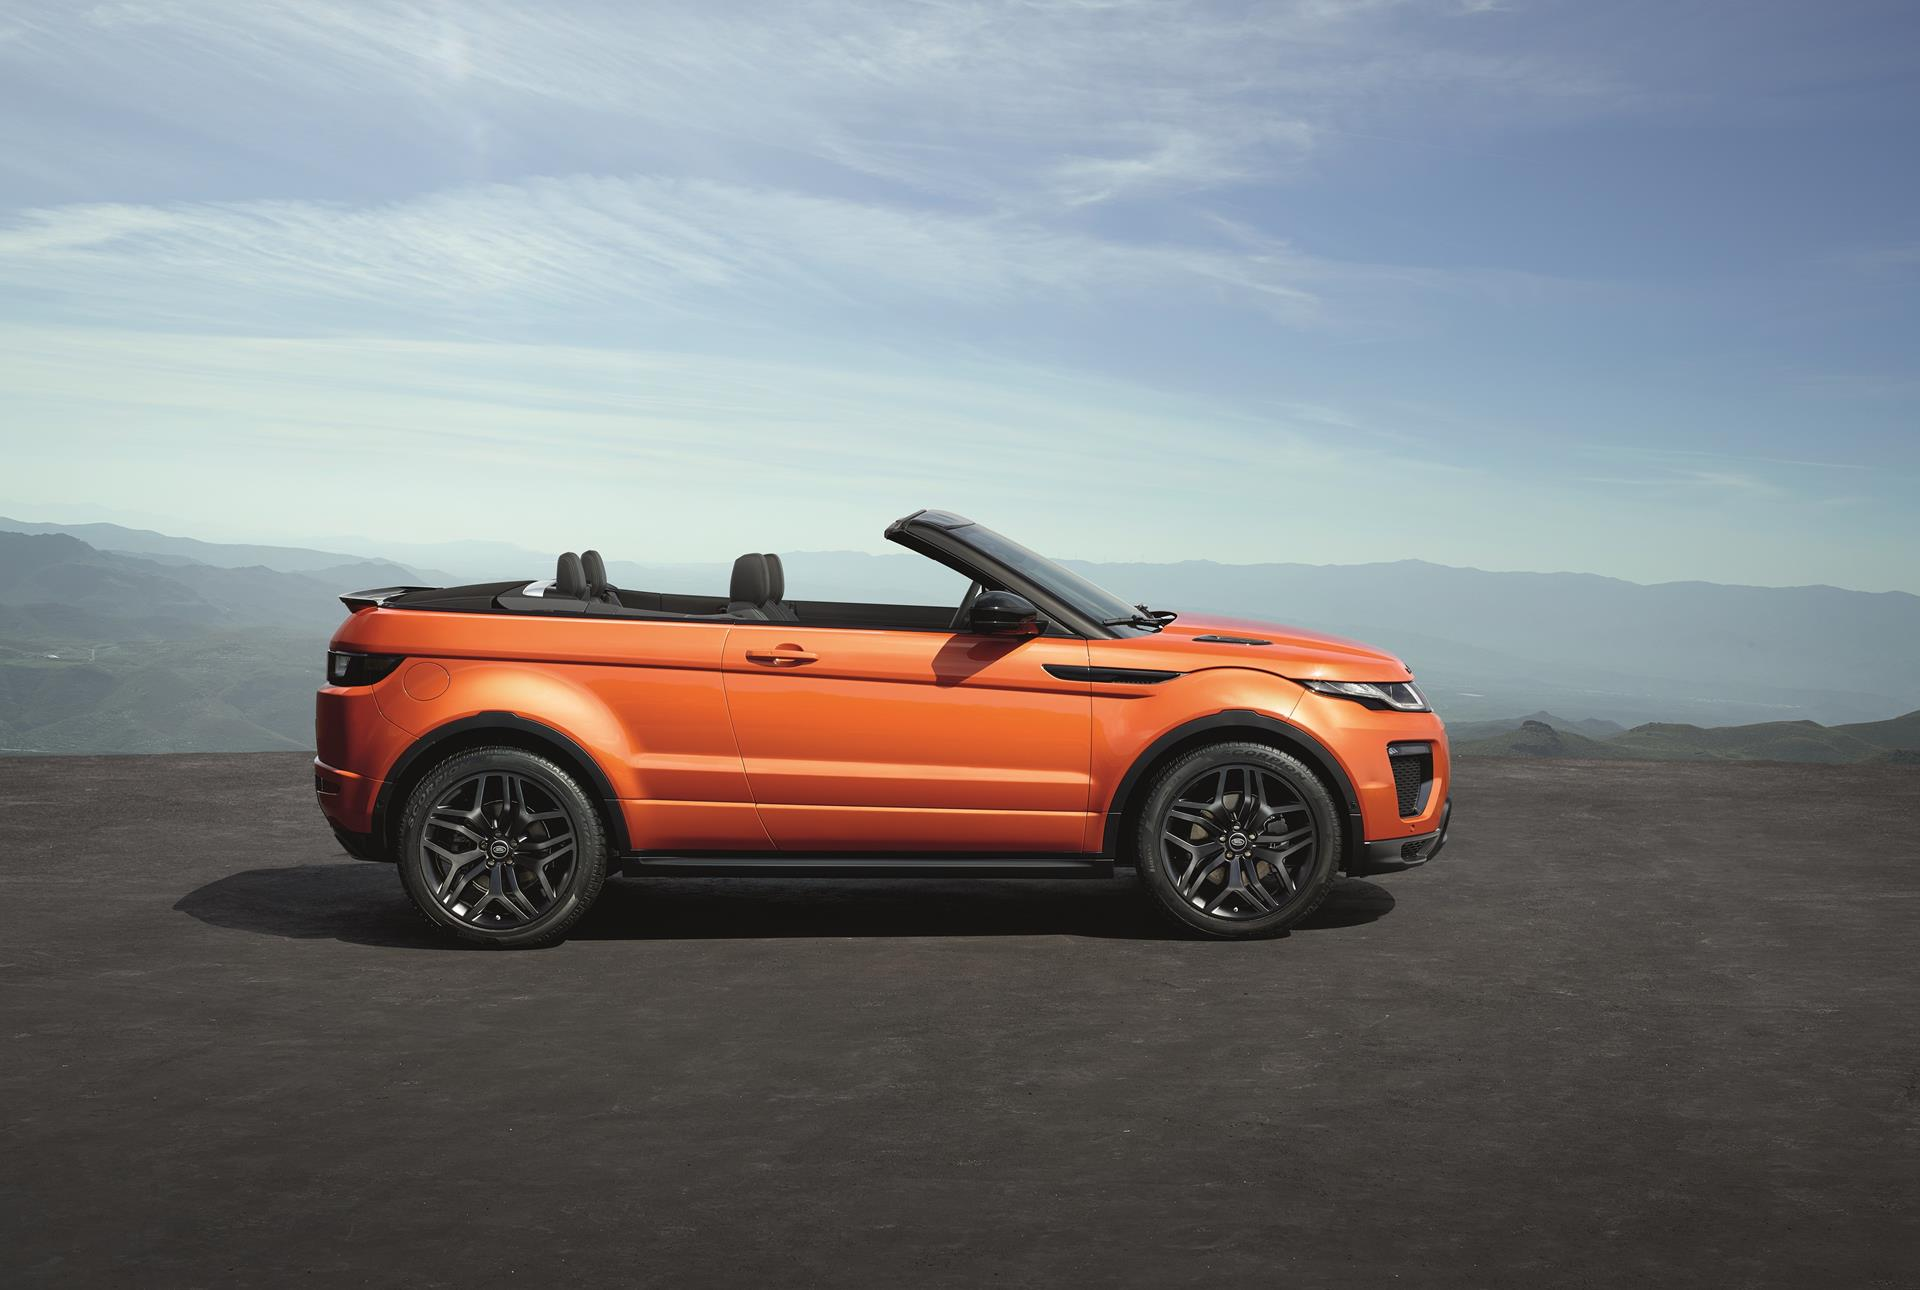 2016 land rover range rover evoque convertible image. Black Bedroom Furniture Sets. Home Design Ideas